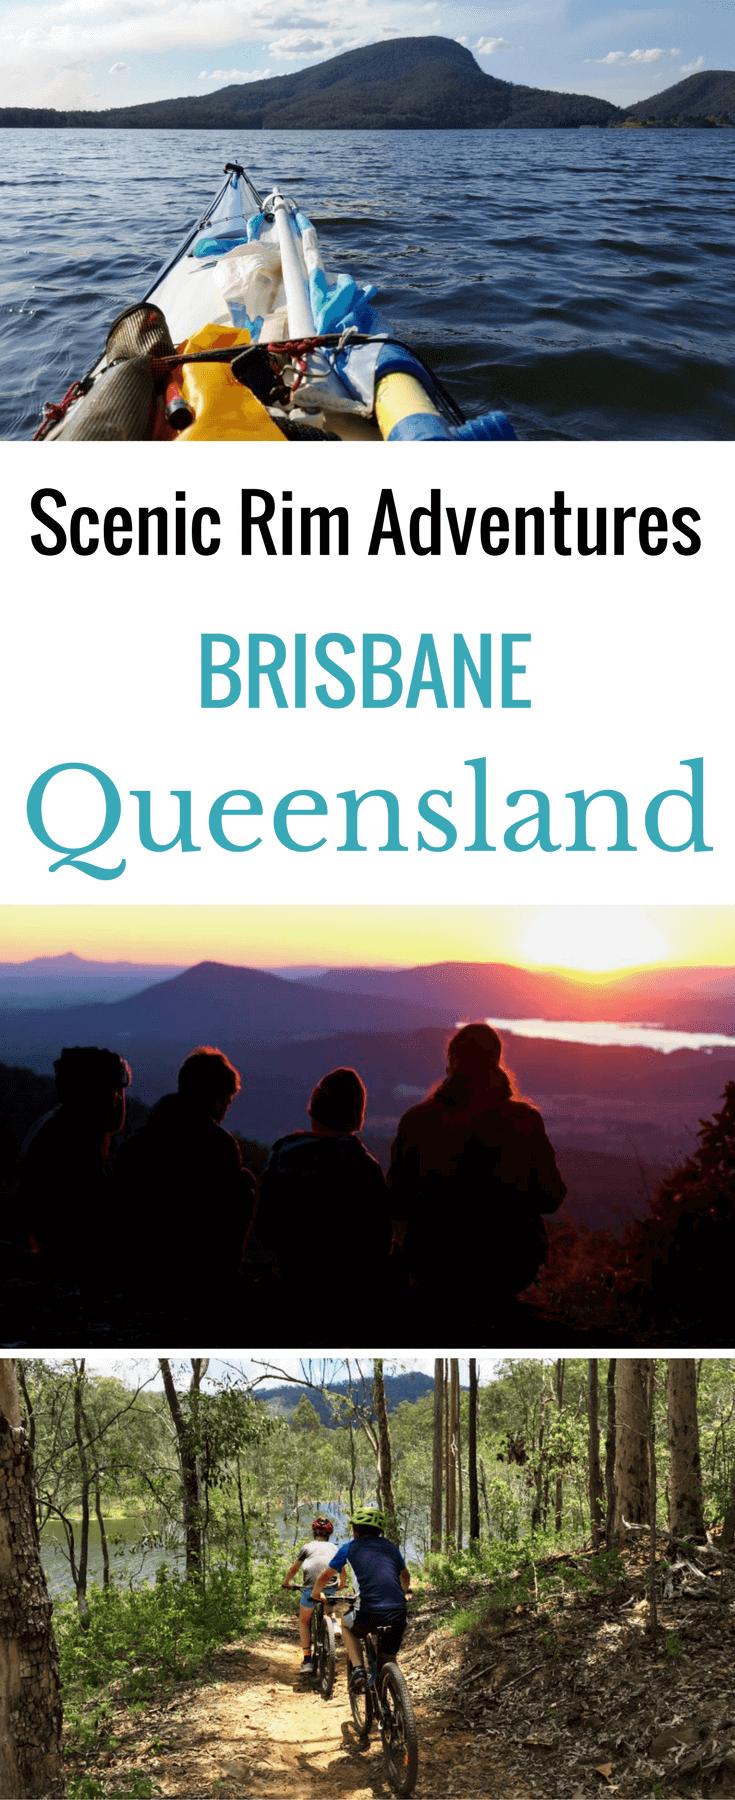 Brisbane Day Trips - Family Adventure in the Scenic Rim, Queensland, Australia